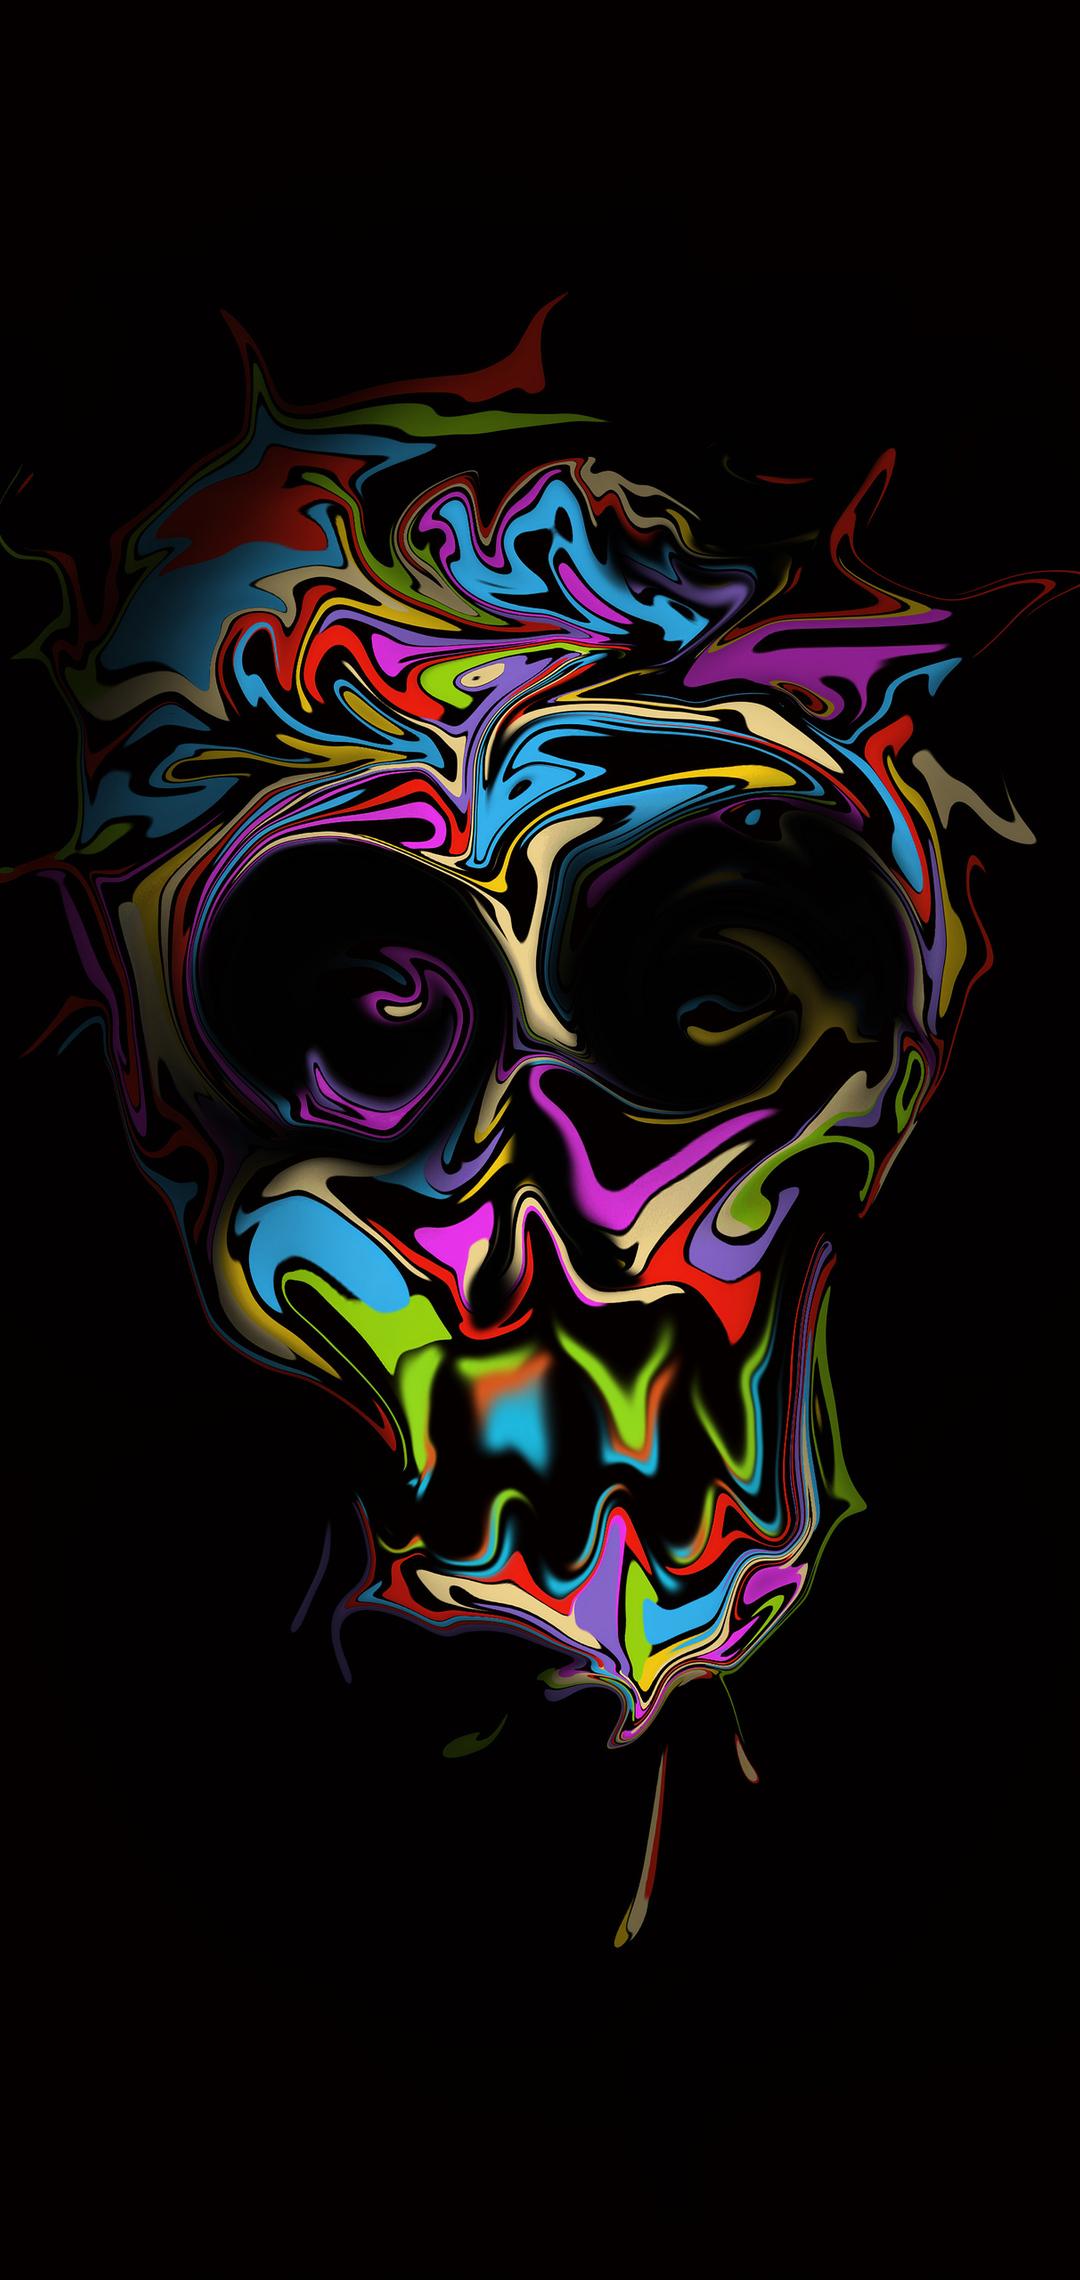 1080x2280 Colorful Skull Dark Art 4k One Plus 6,Huawei p20 ...